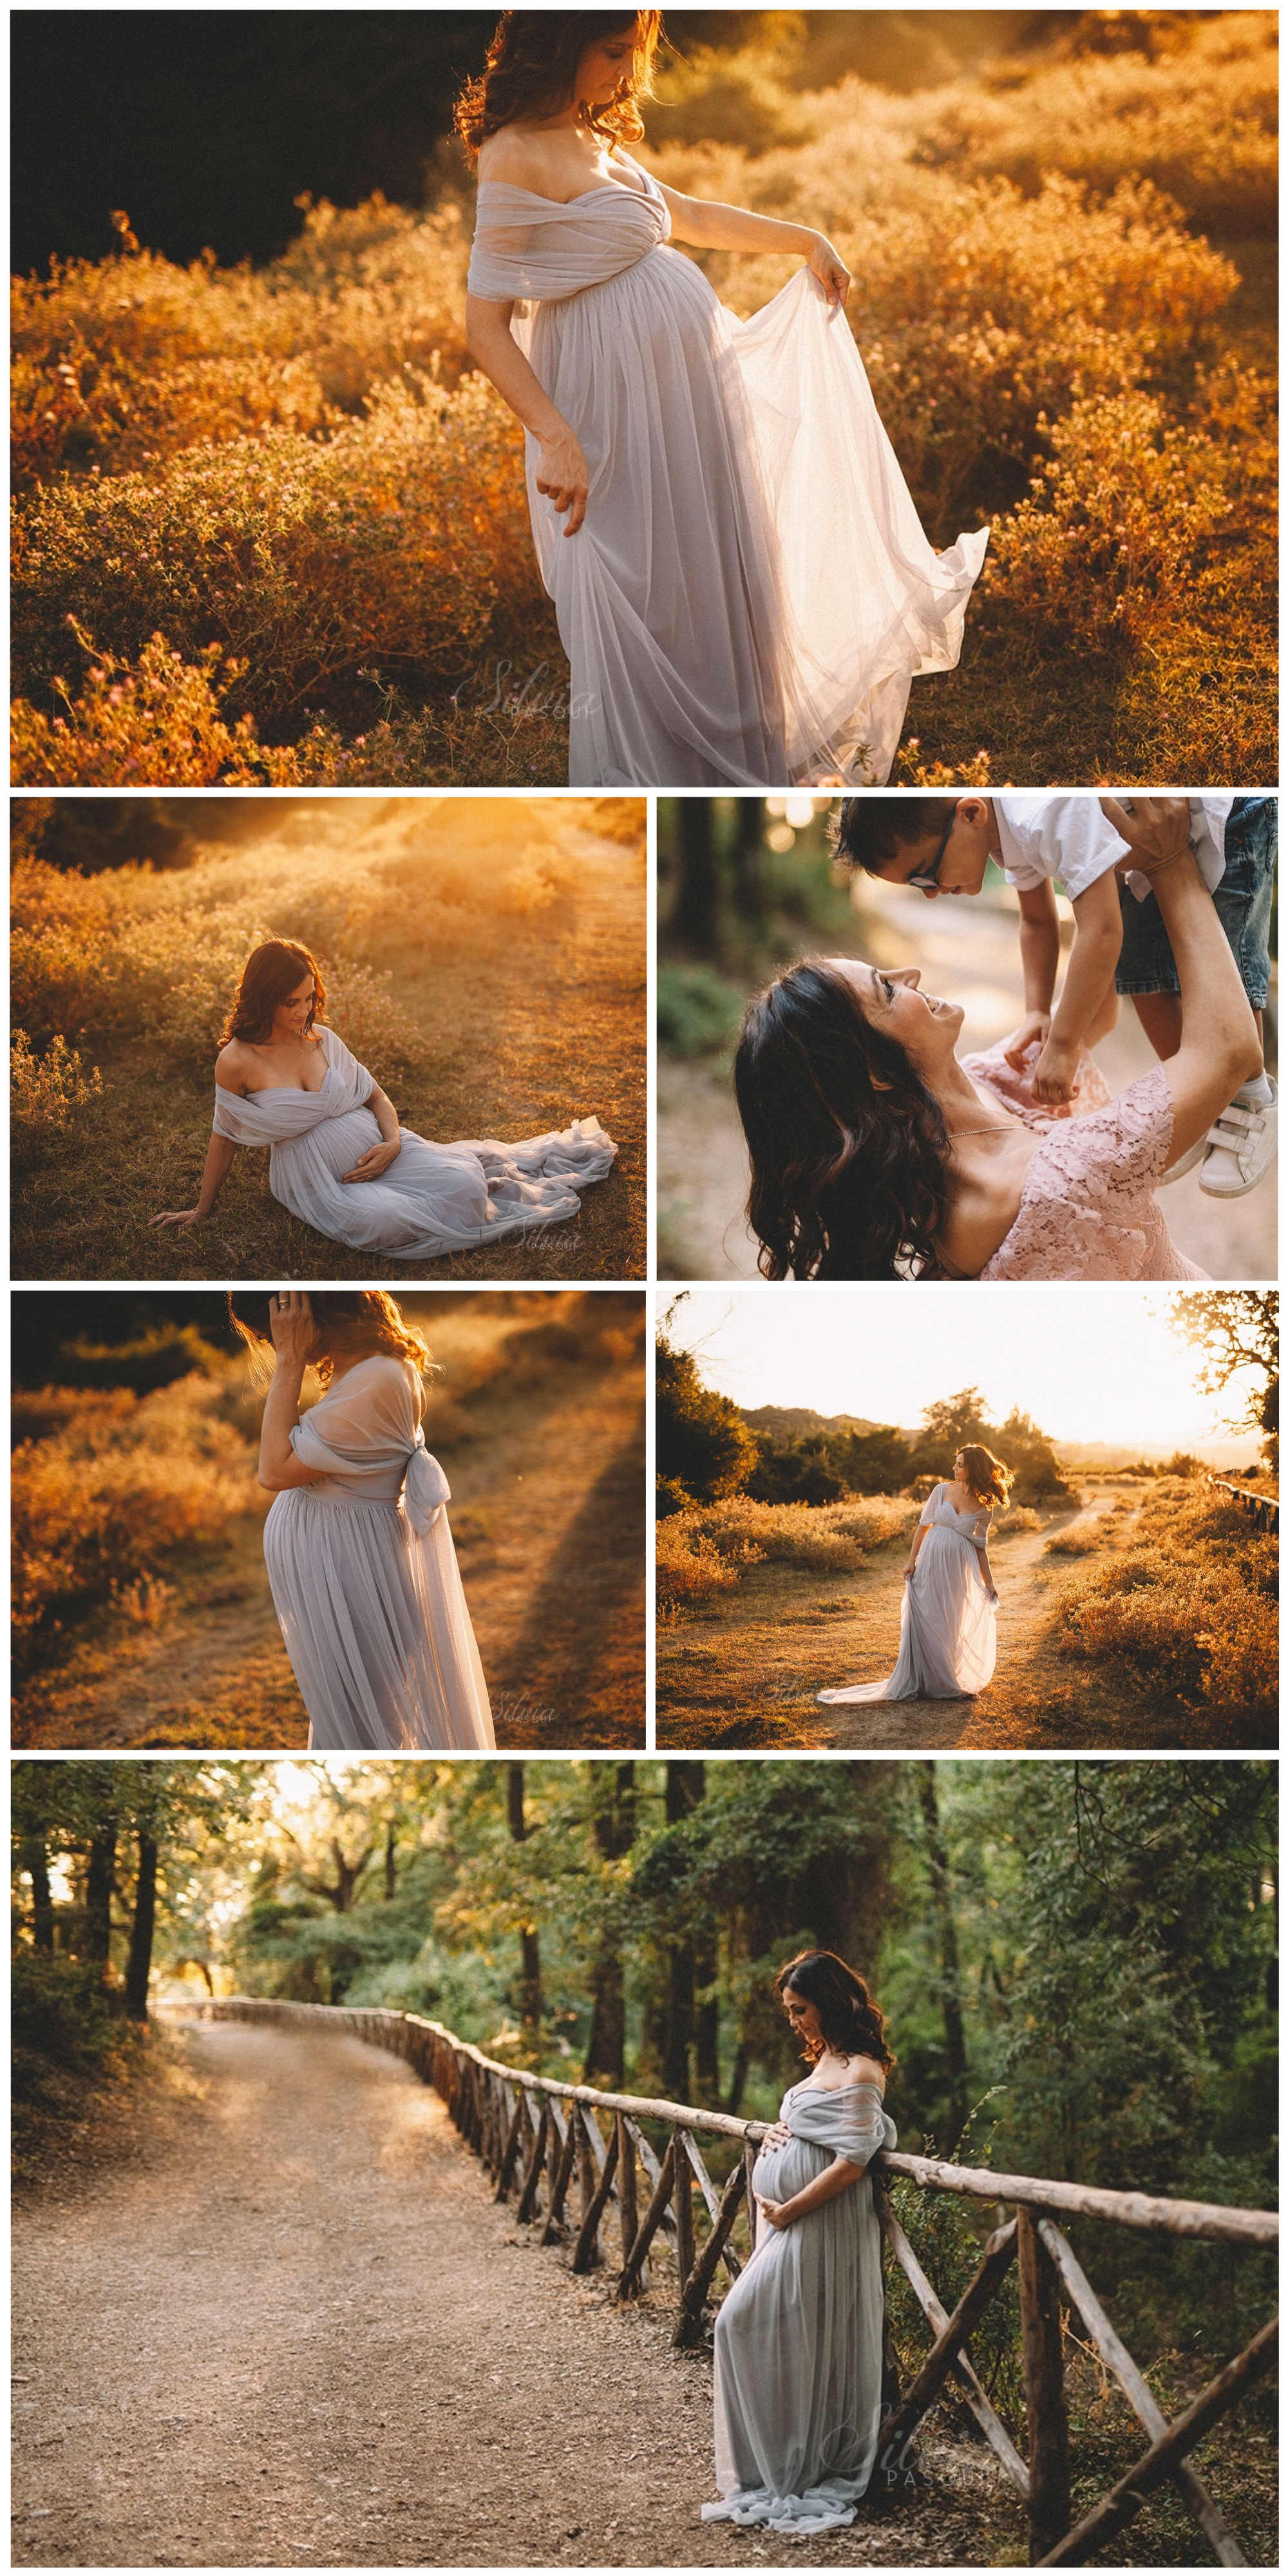 gravidanza fotografa famosa